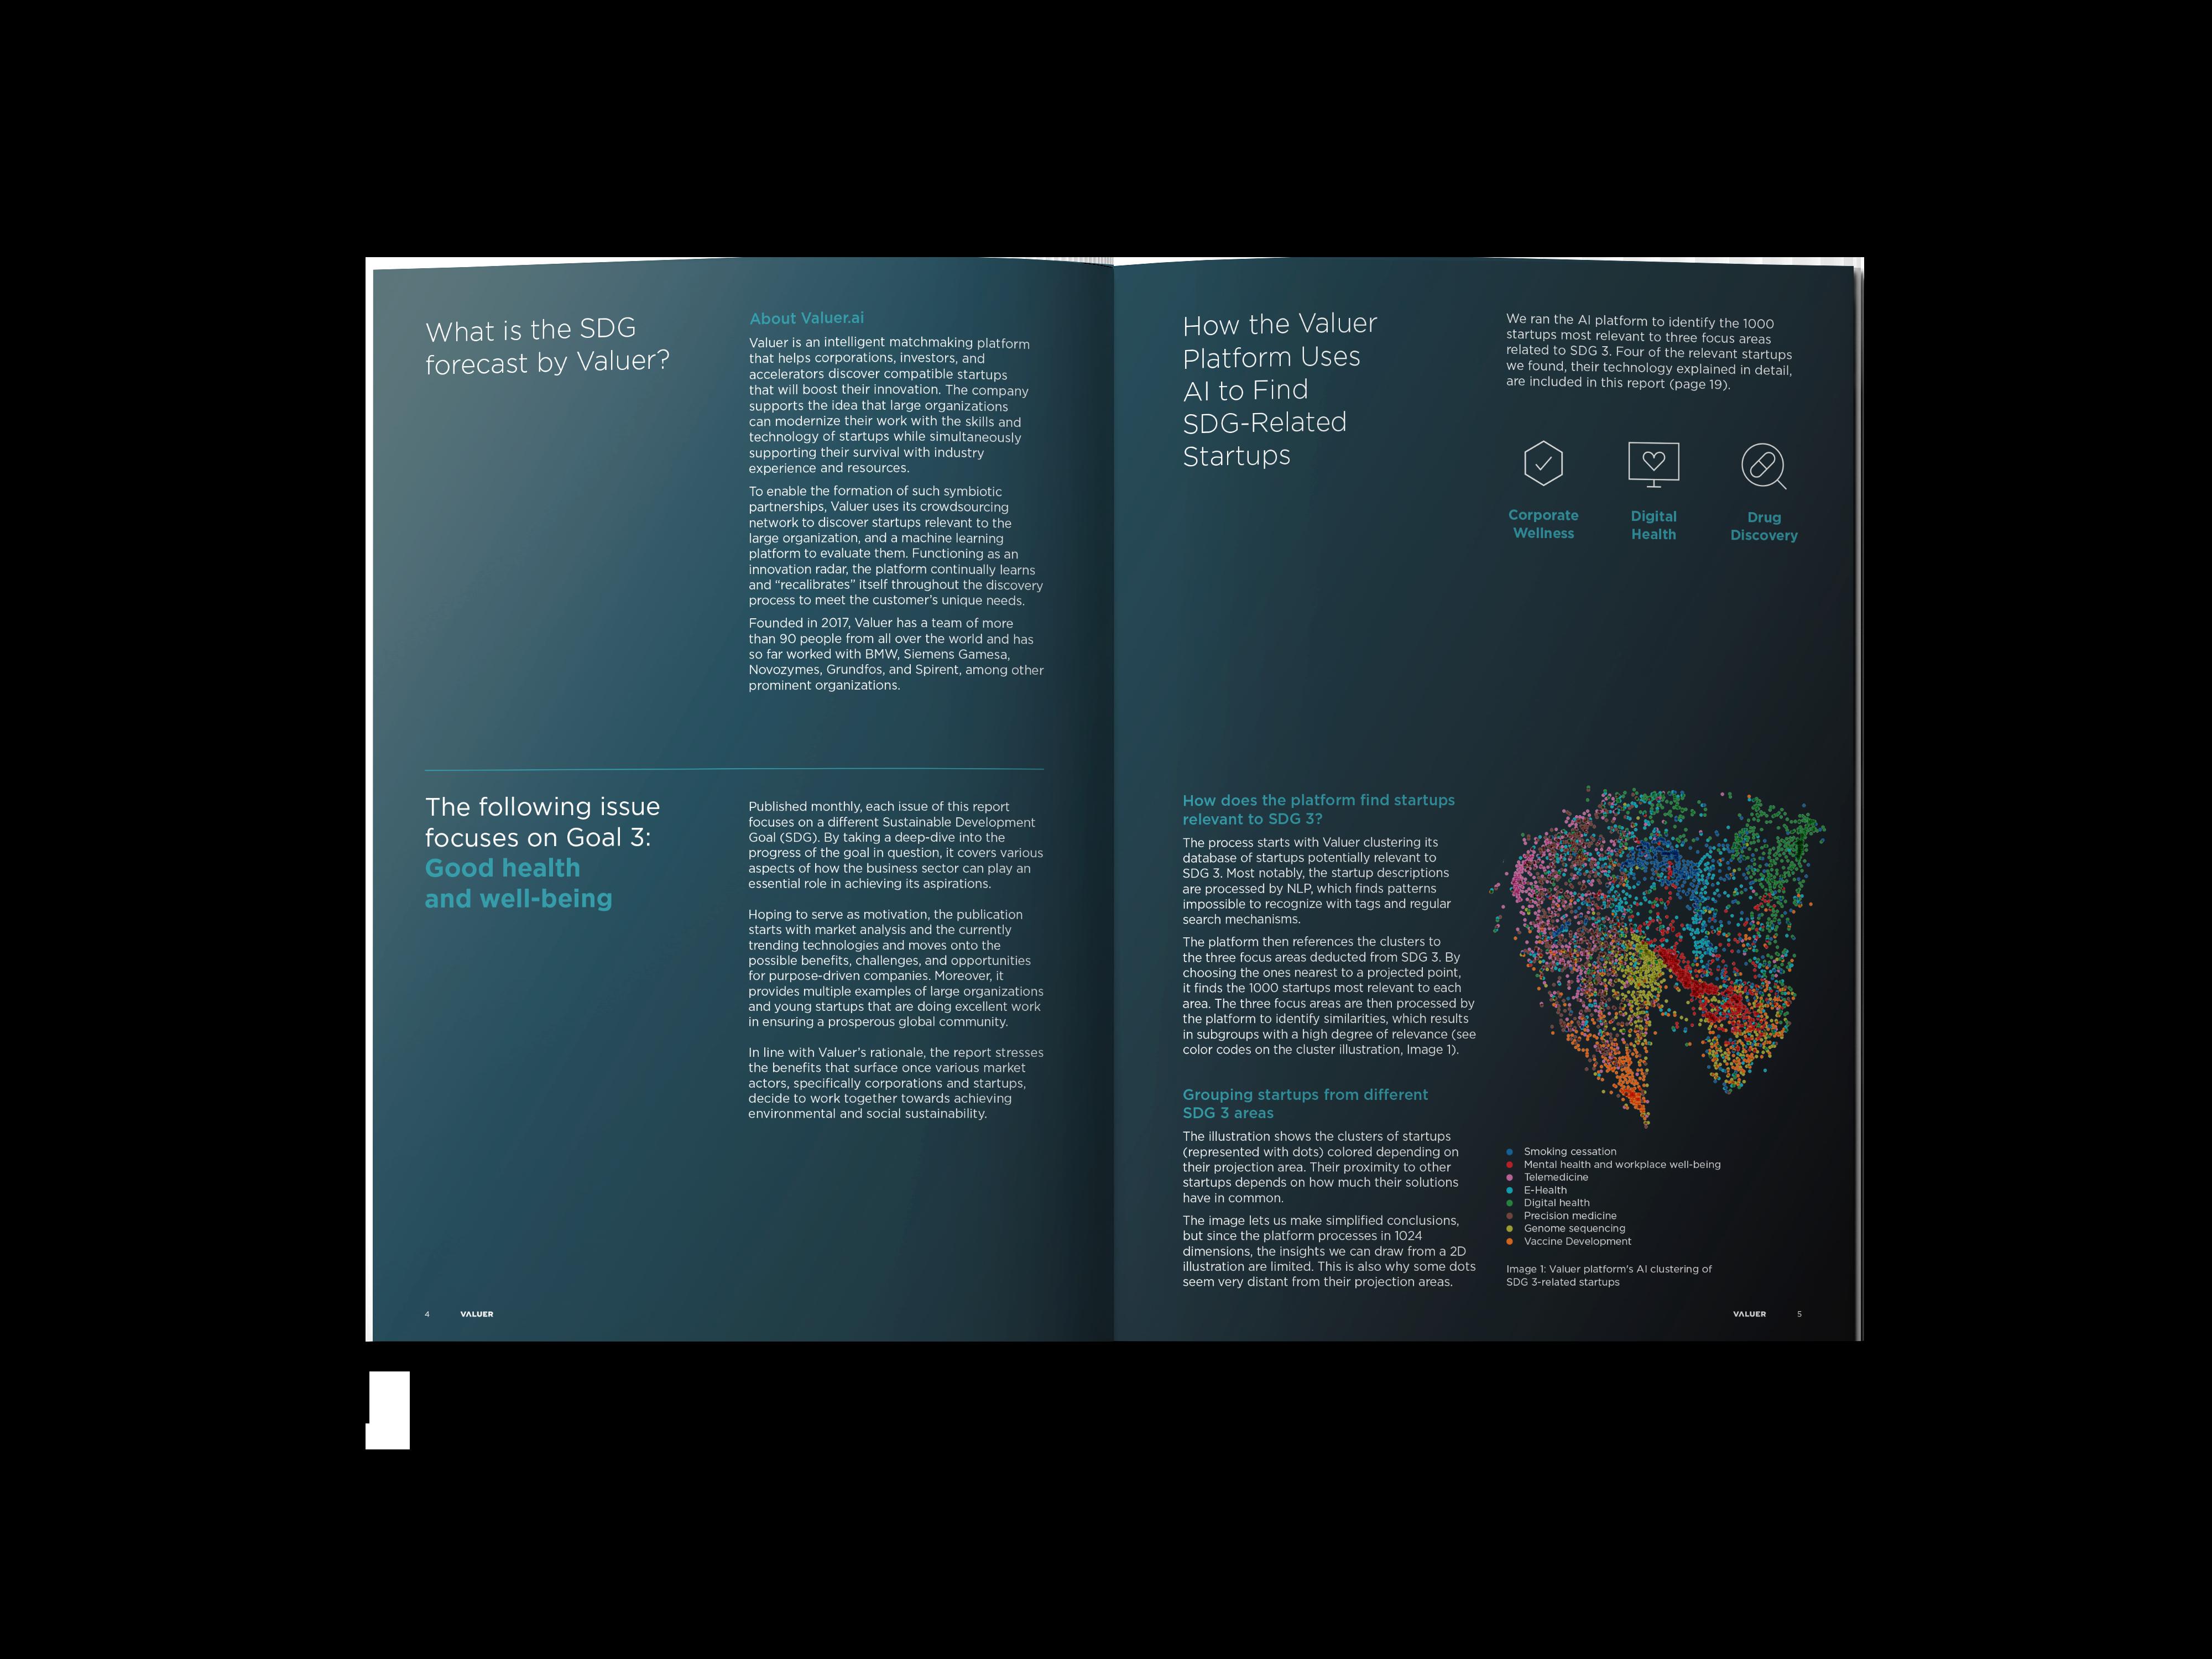 SDG 3 forecast page 4-5